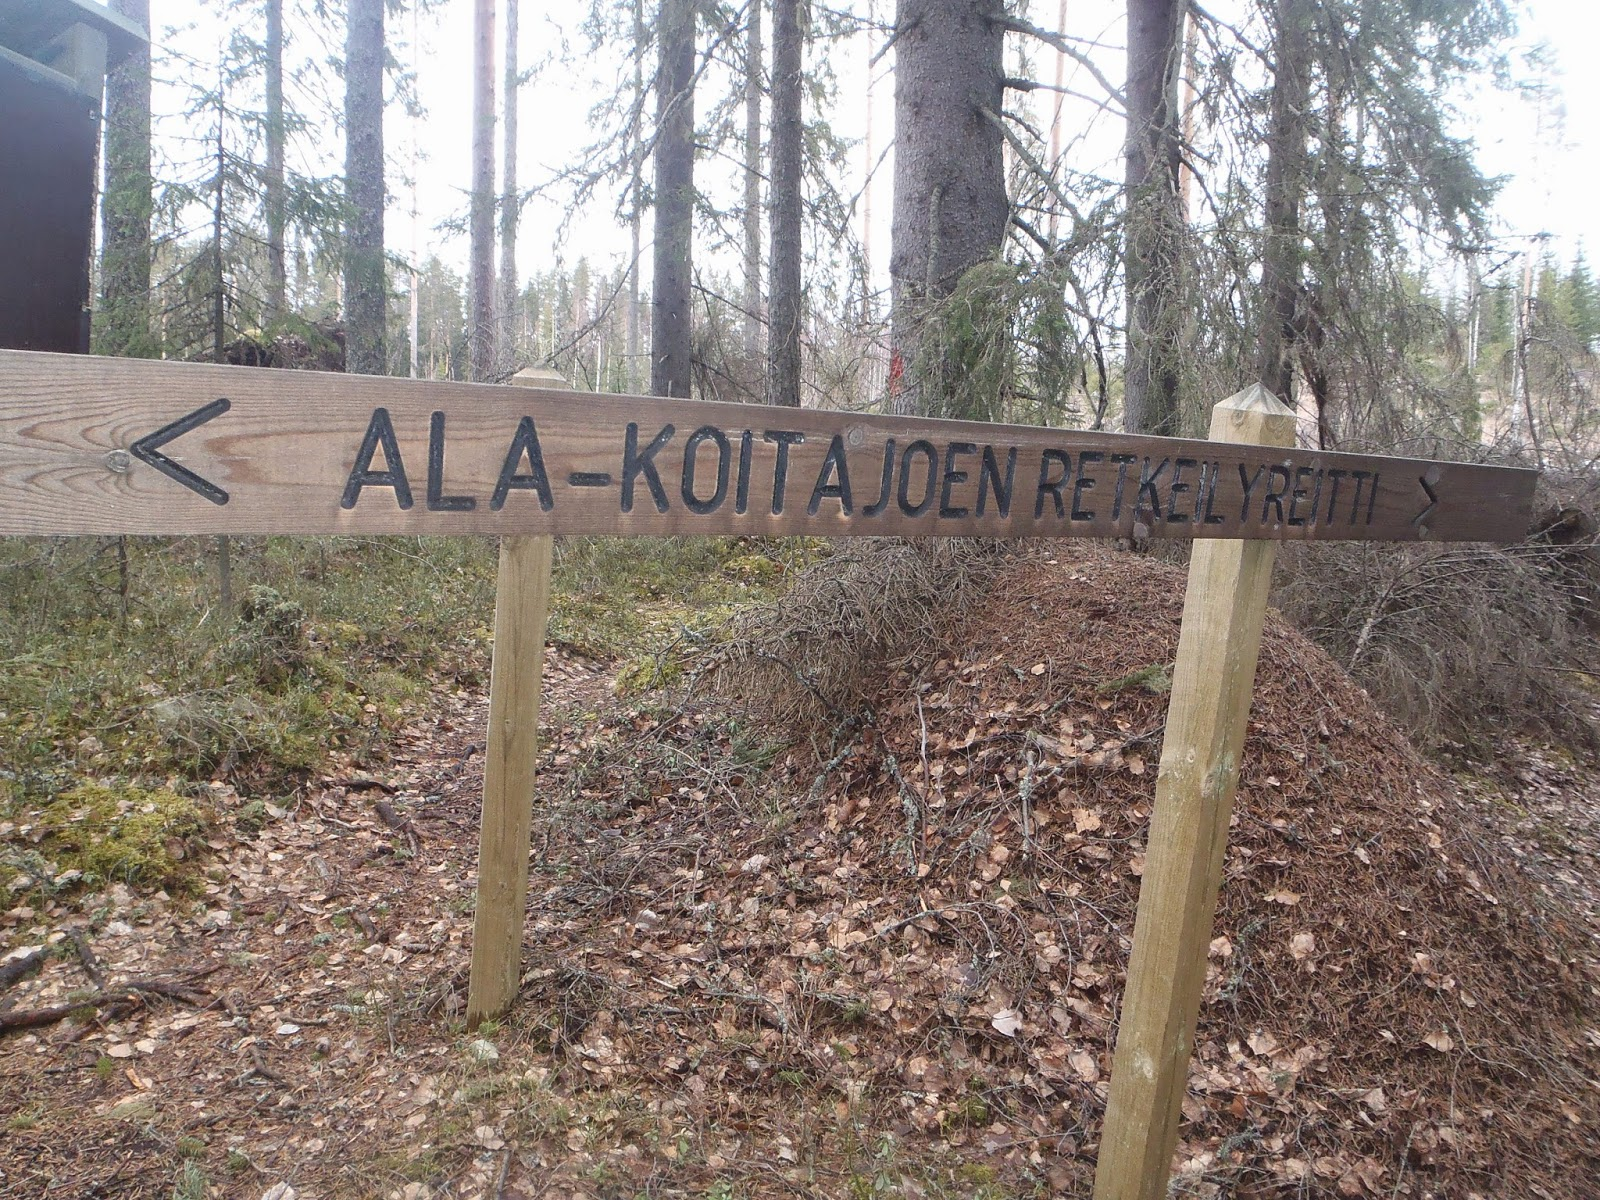 Kebnekaisun Retkitarinoita Ala Koitajoella